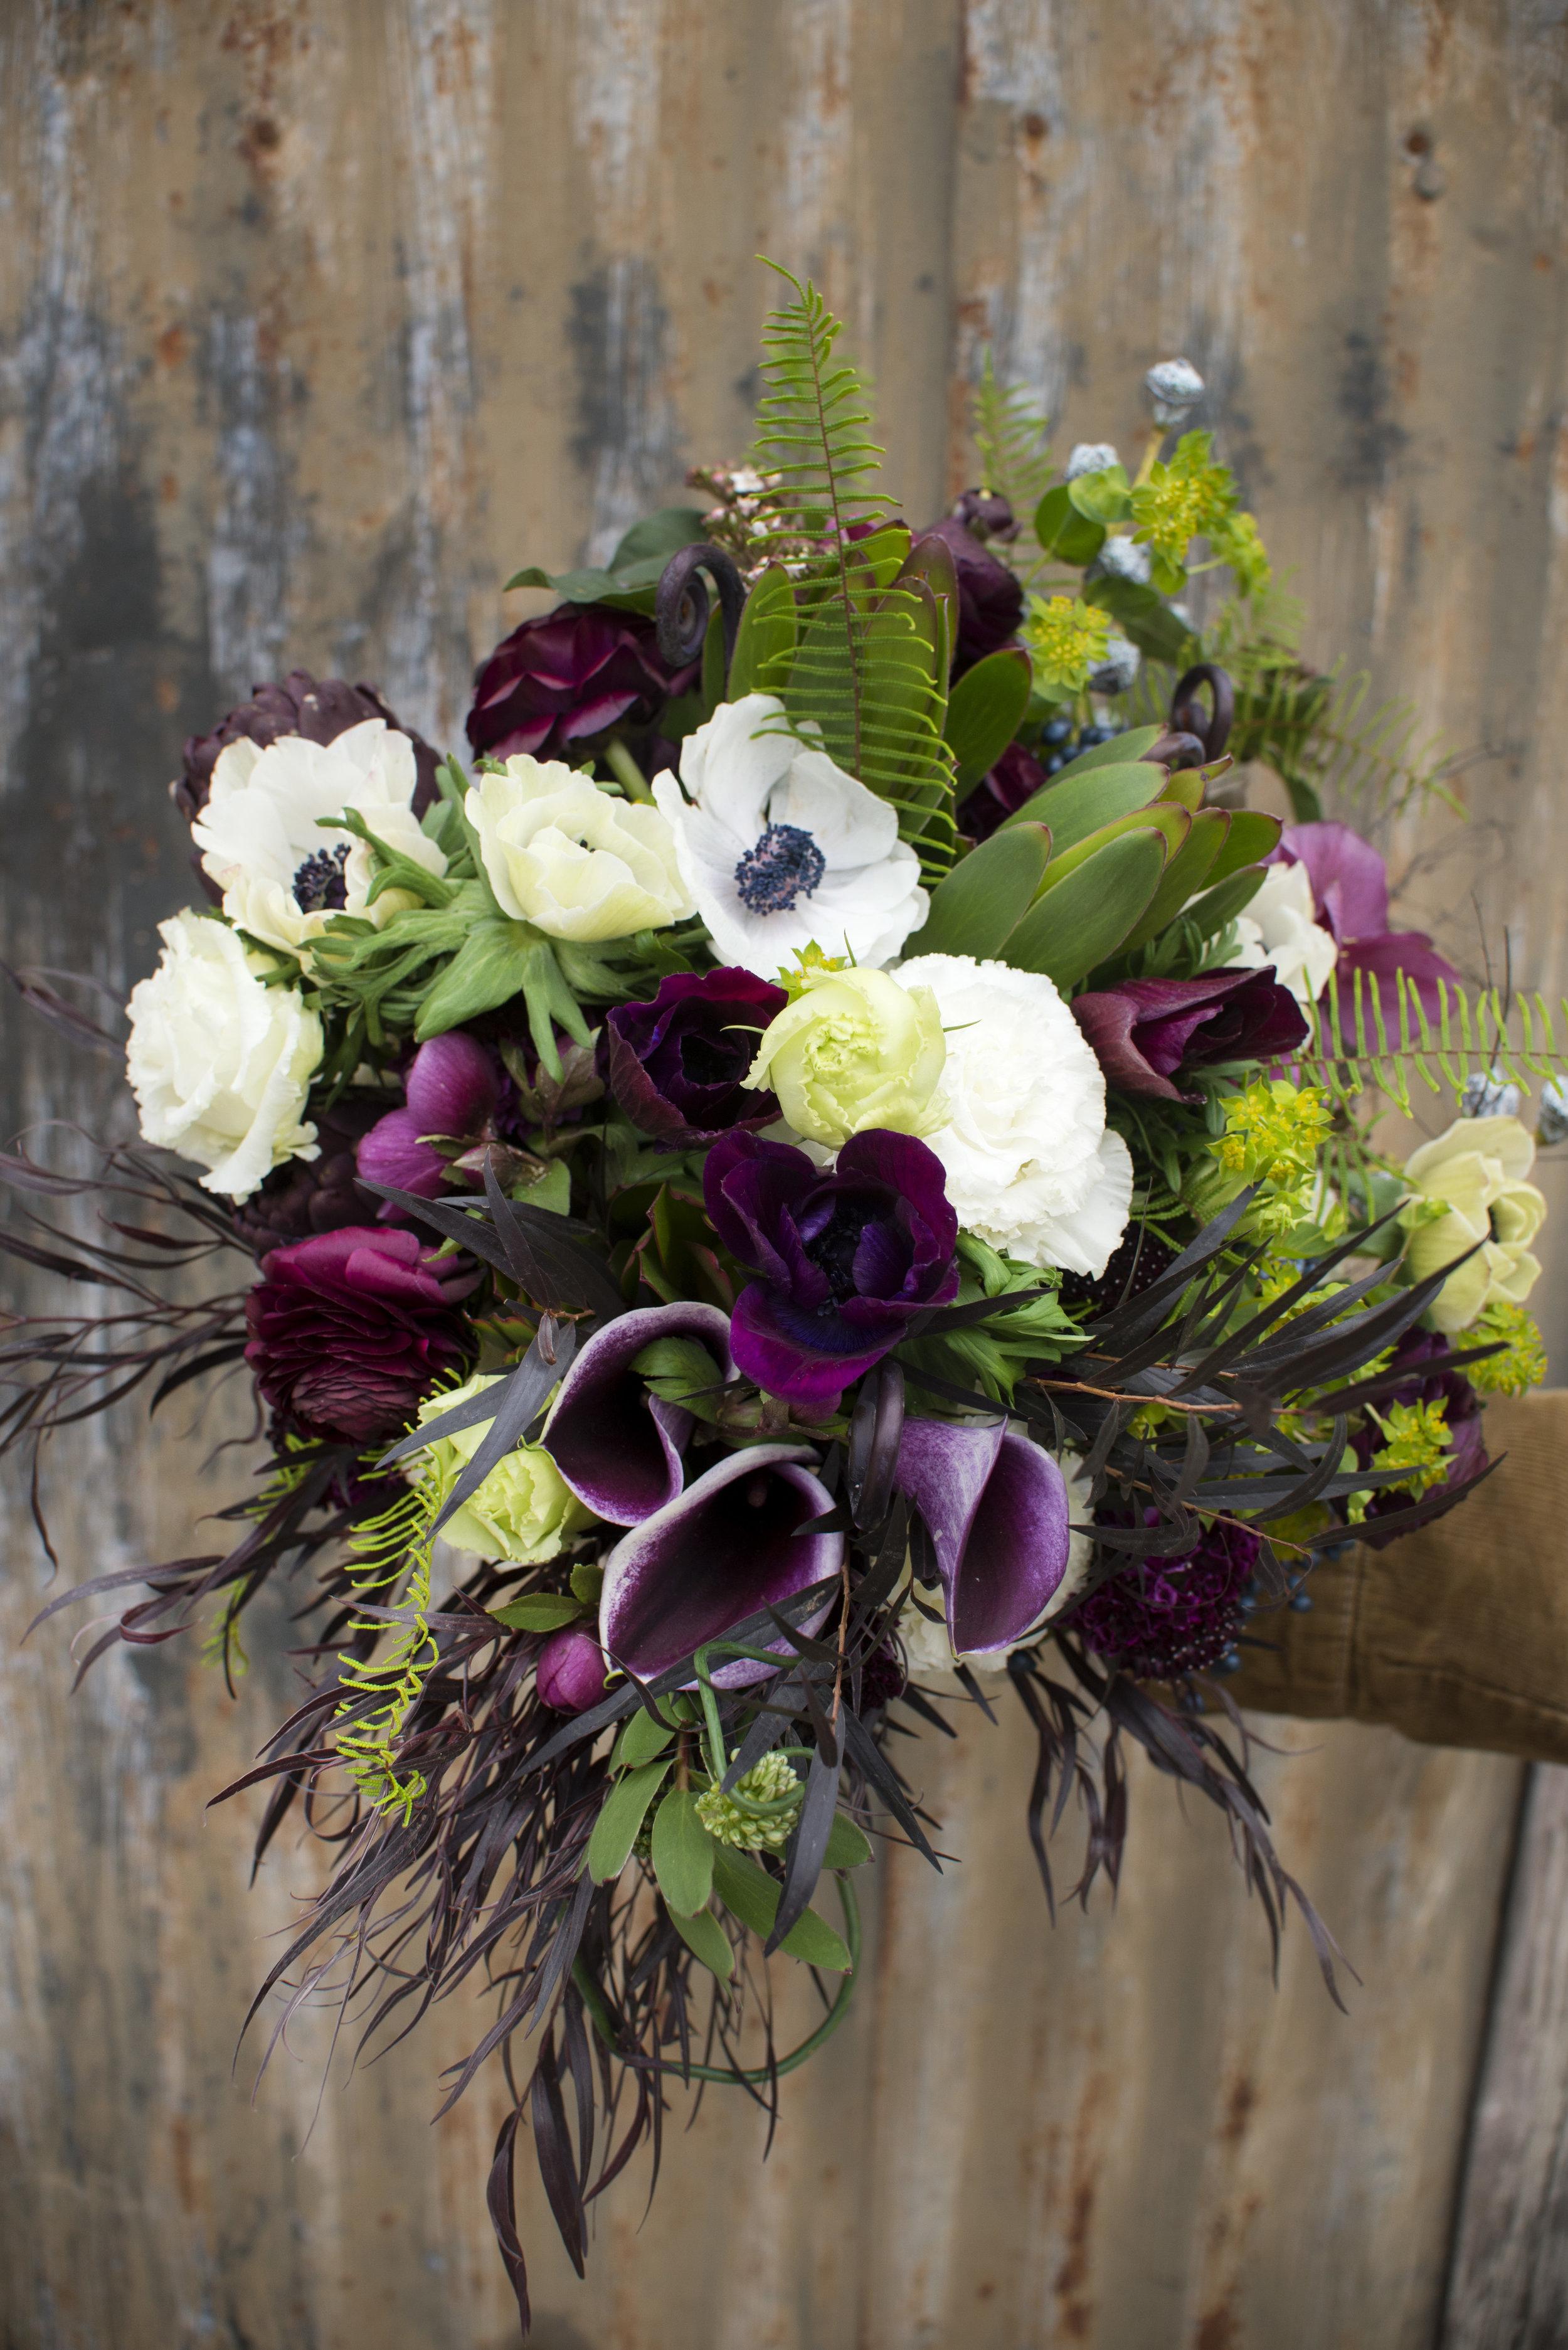 mitchs flowers denys mertz bouquet horiculturist elope new orleans florst near you.jpg